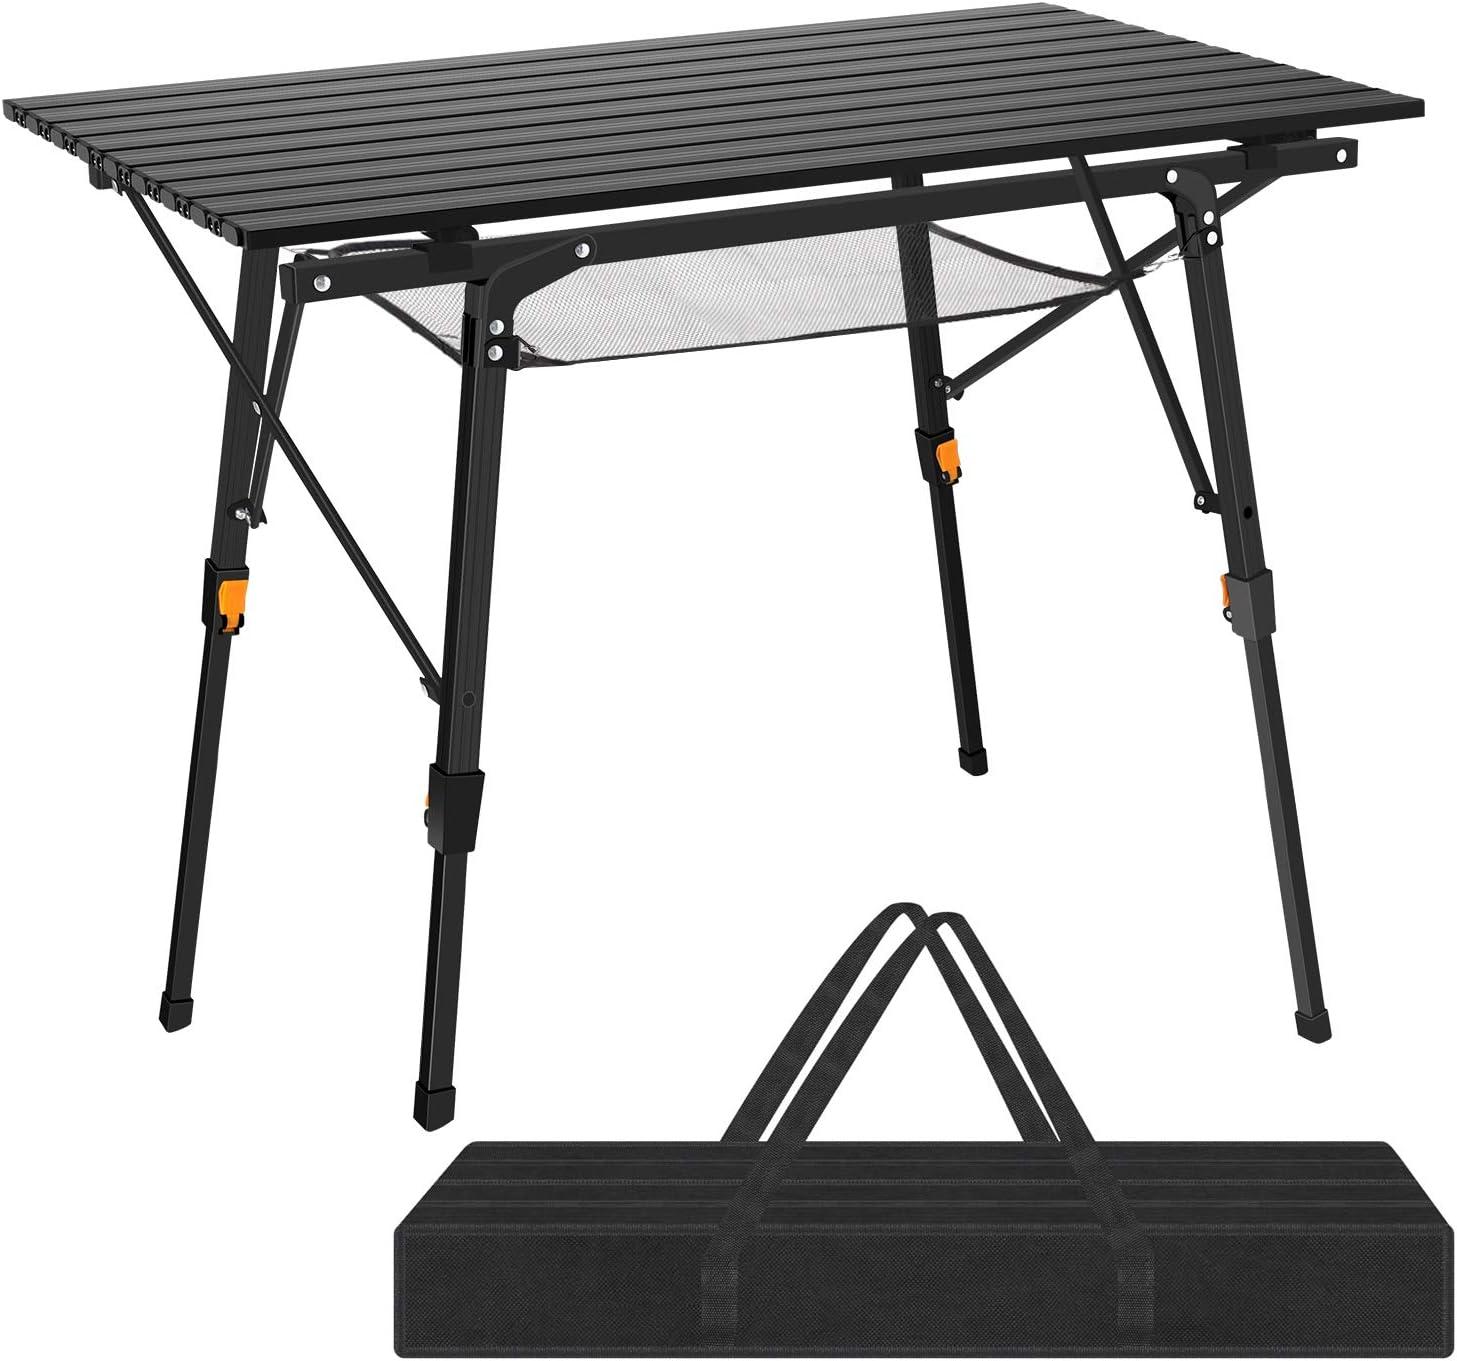 Nestling - Mesa Plegable portátil de Aluminio para Camping o jardín, Plegable, para Acampada, Cocina, Altura Ajustable (2 Partes, Bolsa de Transporte) (Negro)